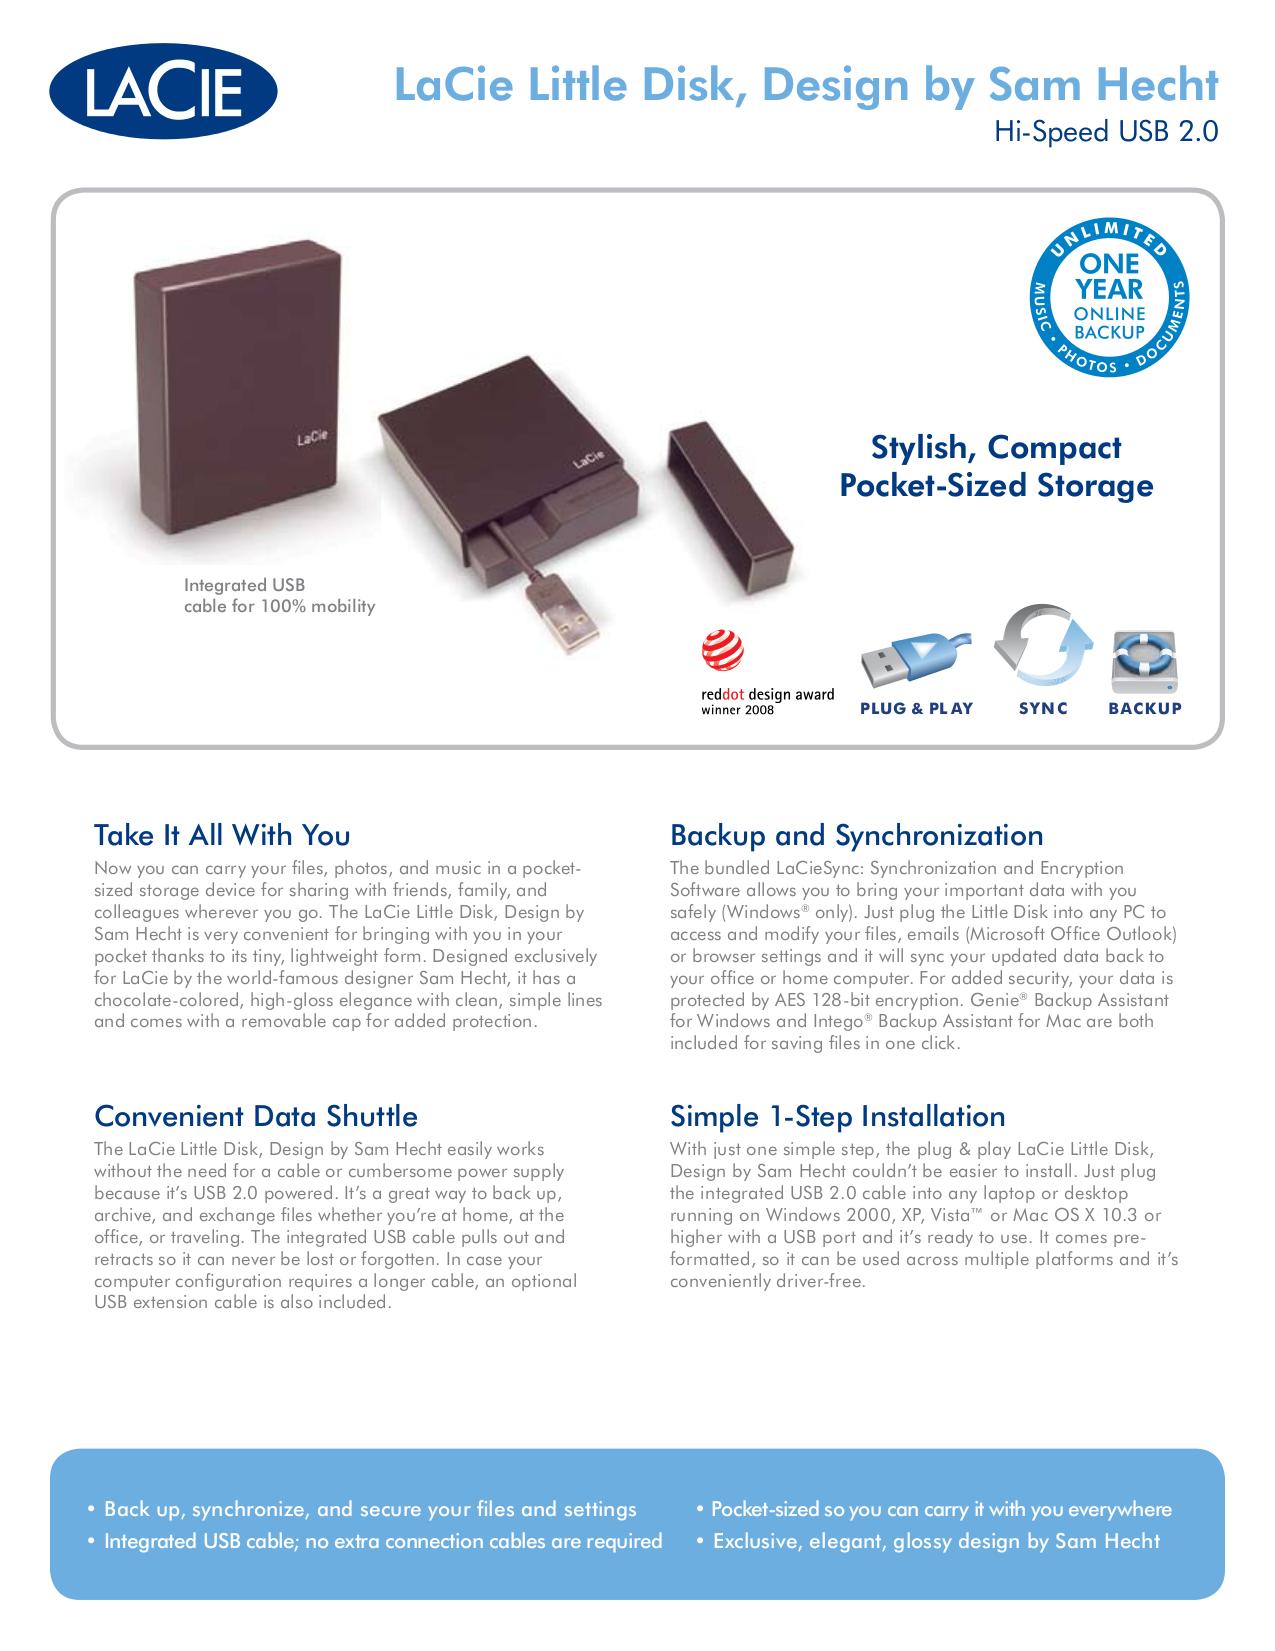 pdf for LaCie Storage 301273 manual